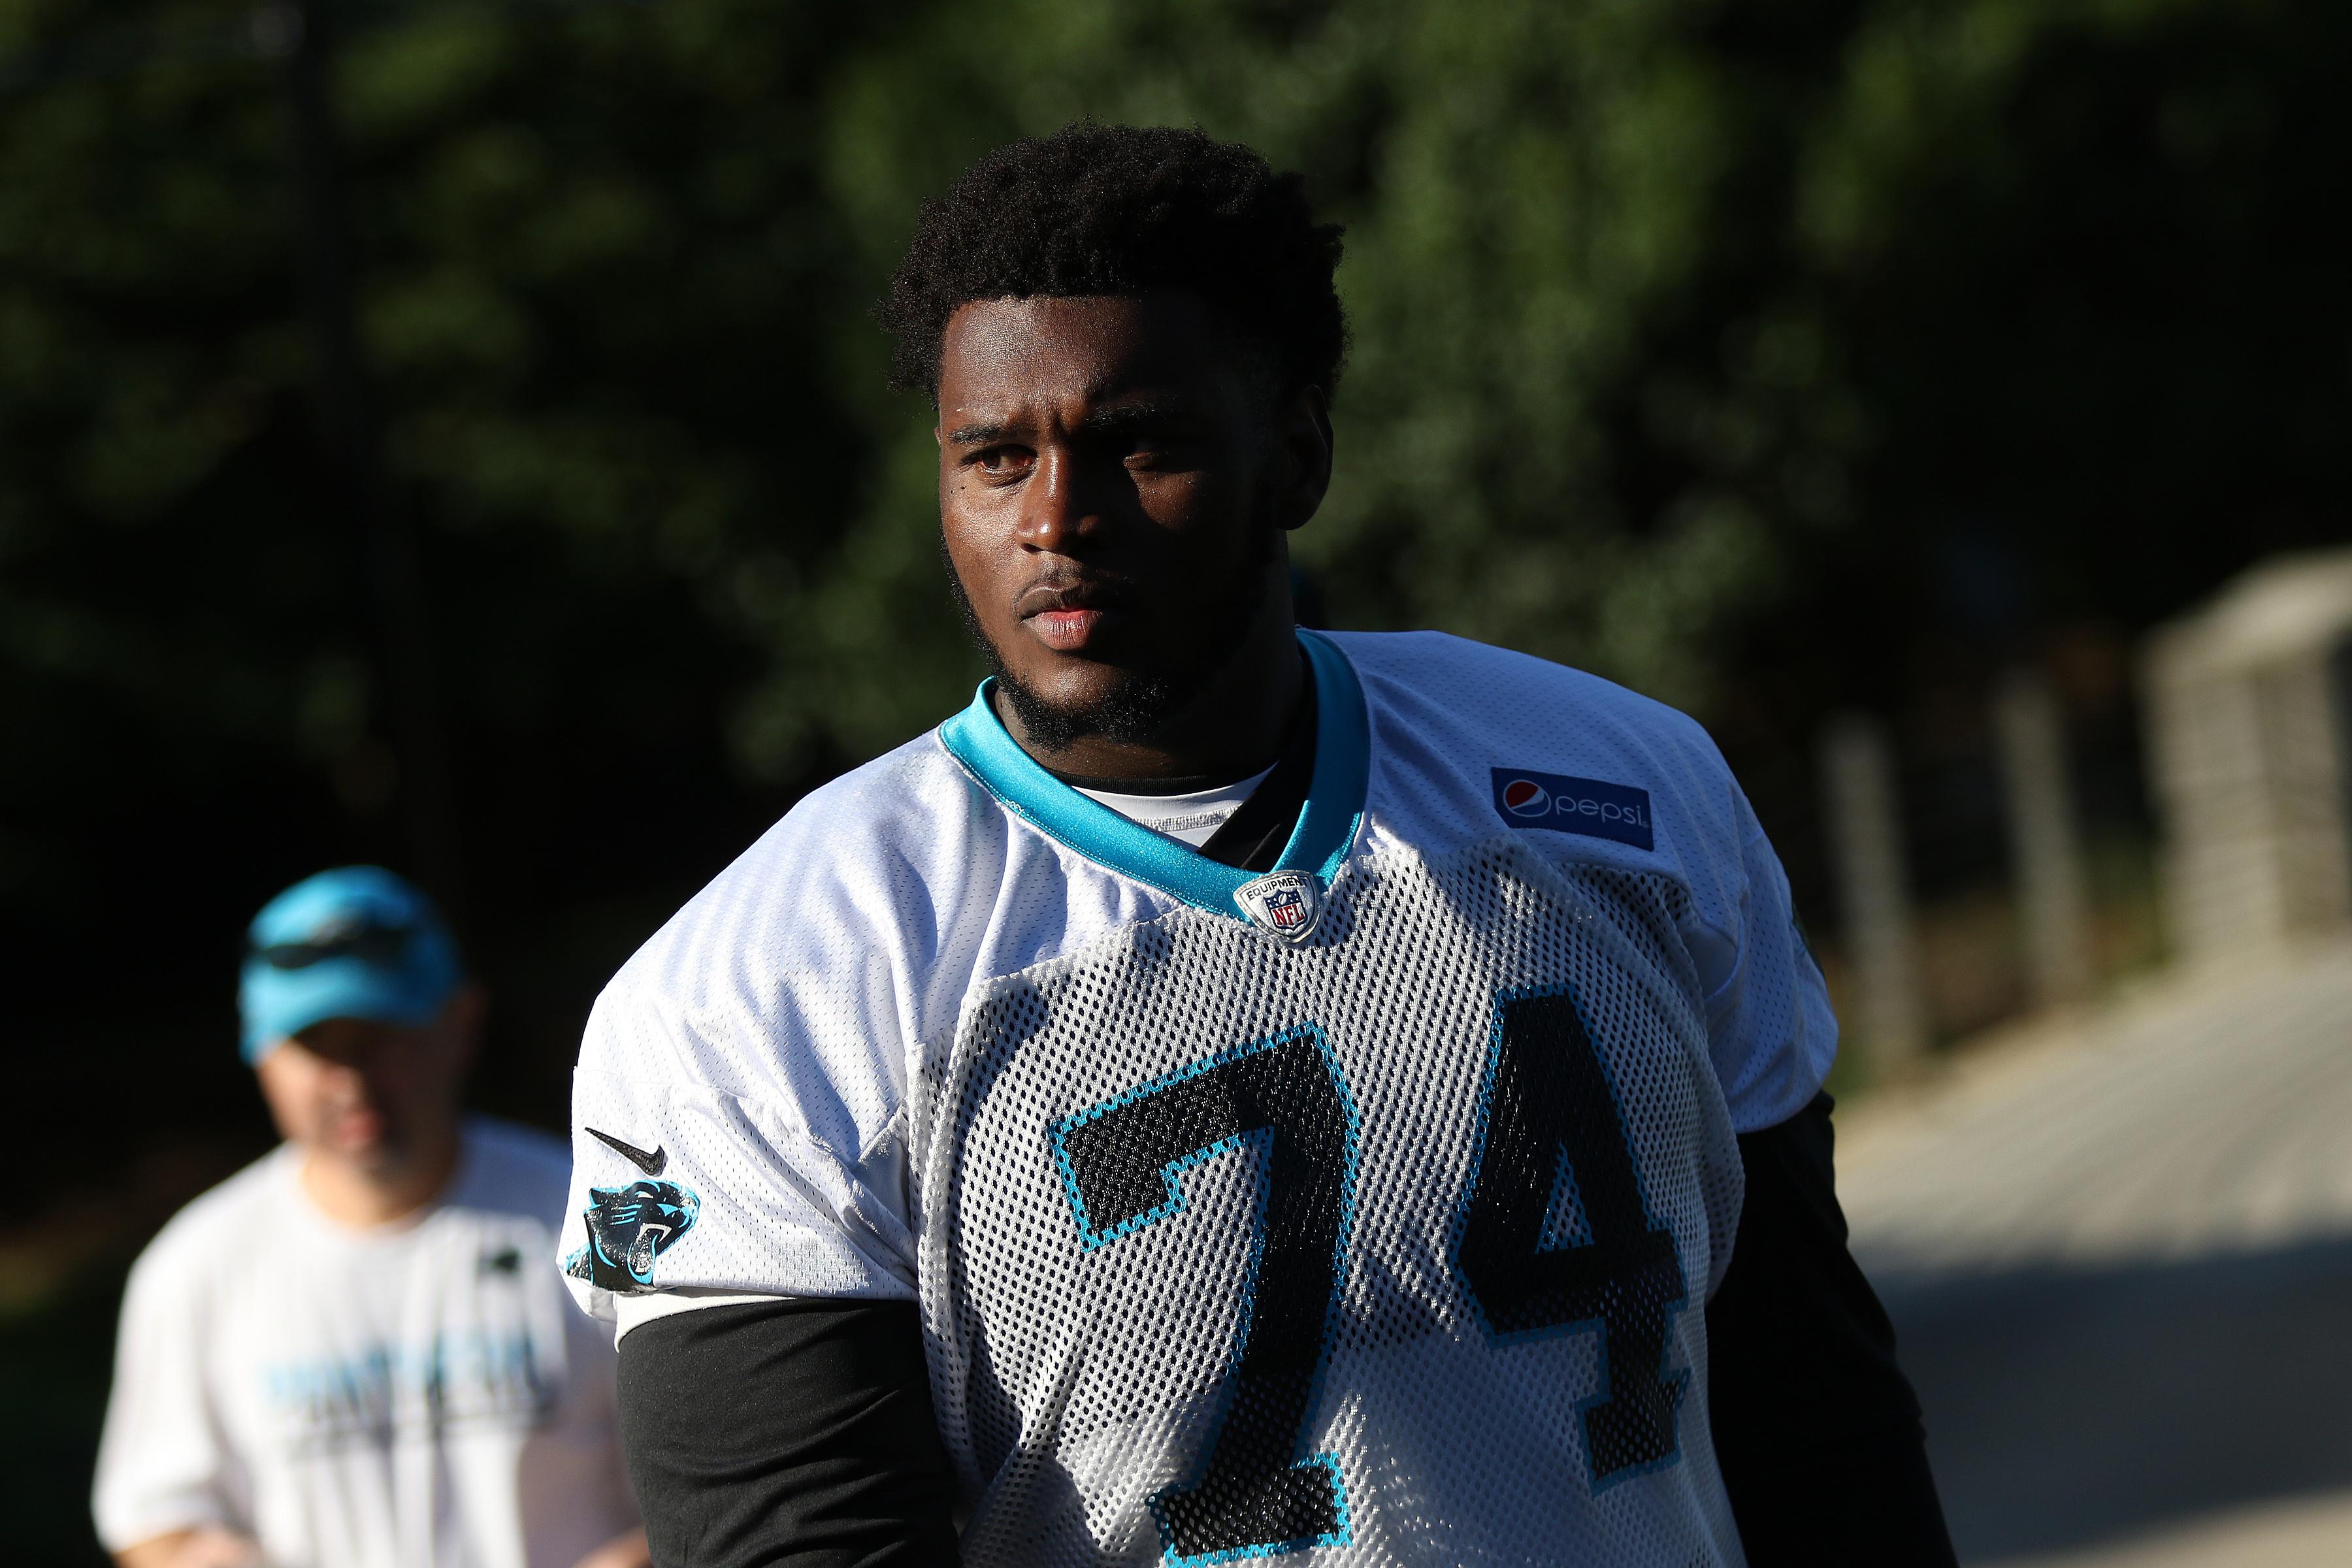 NFL: JUN 04 Panthers OTA